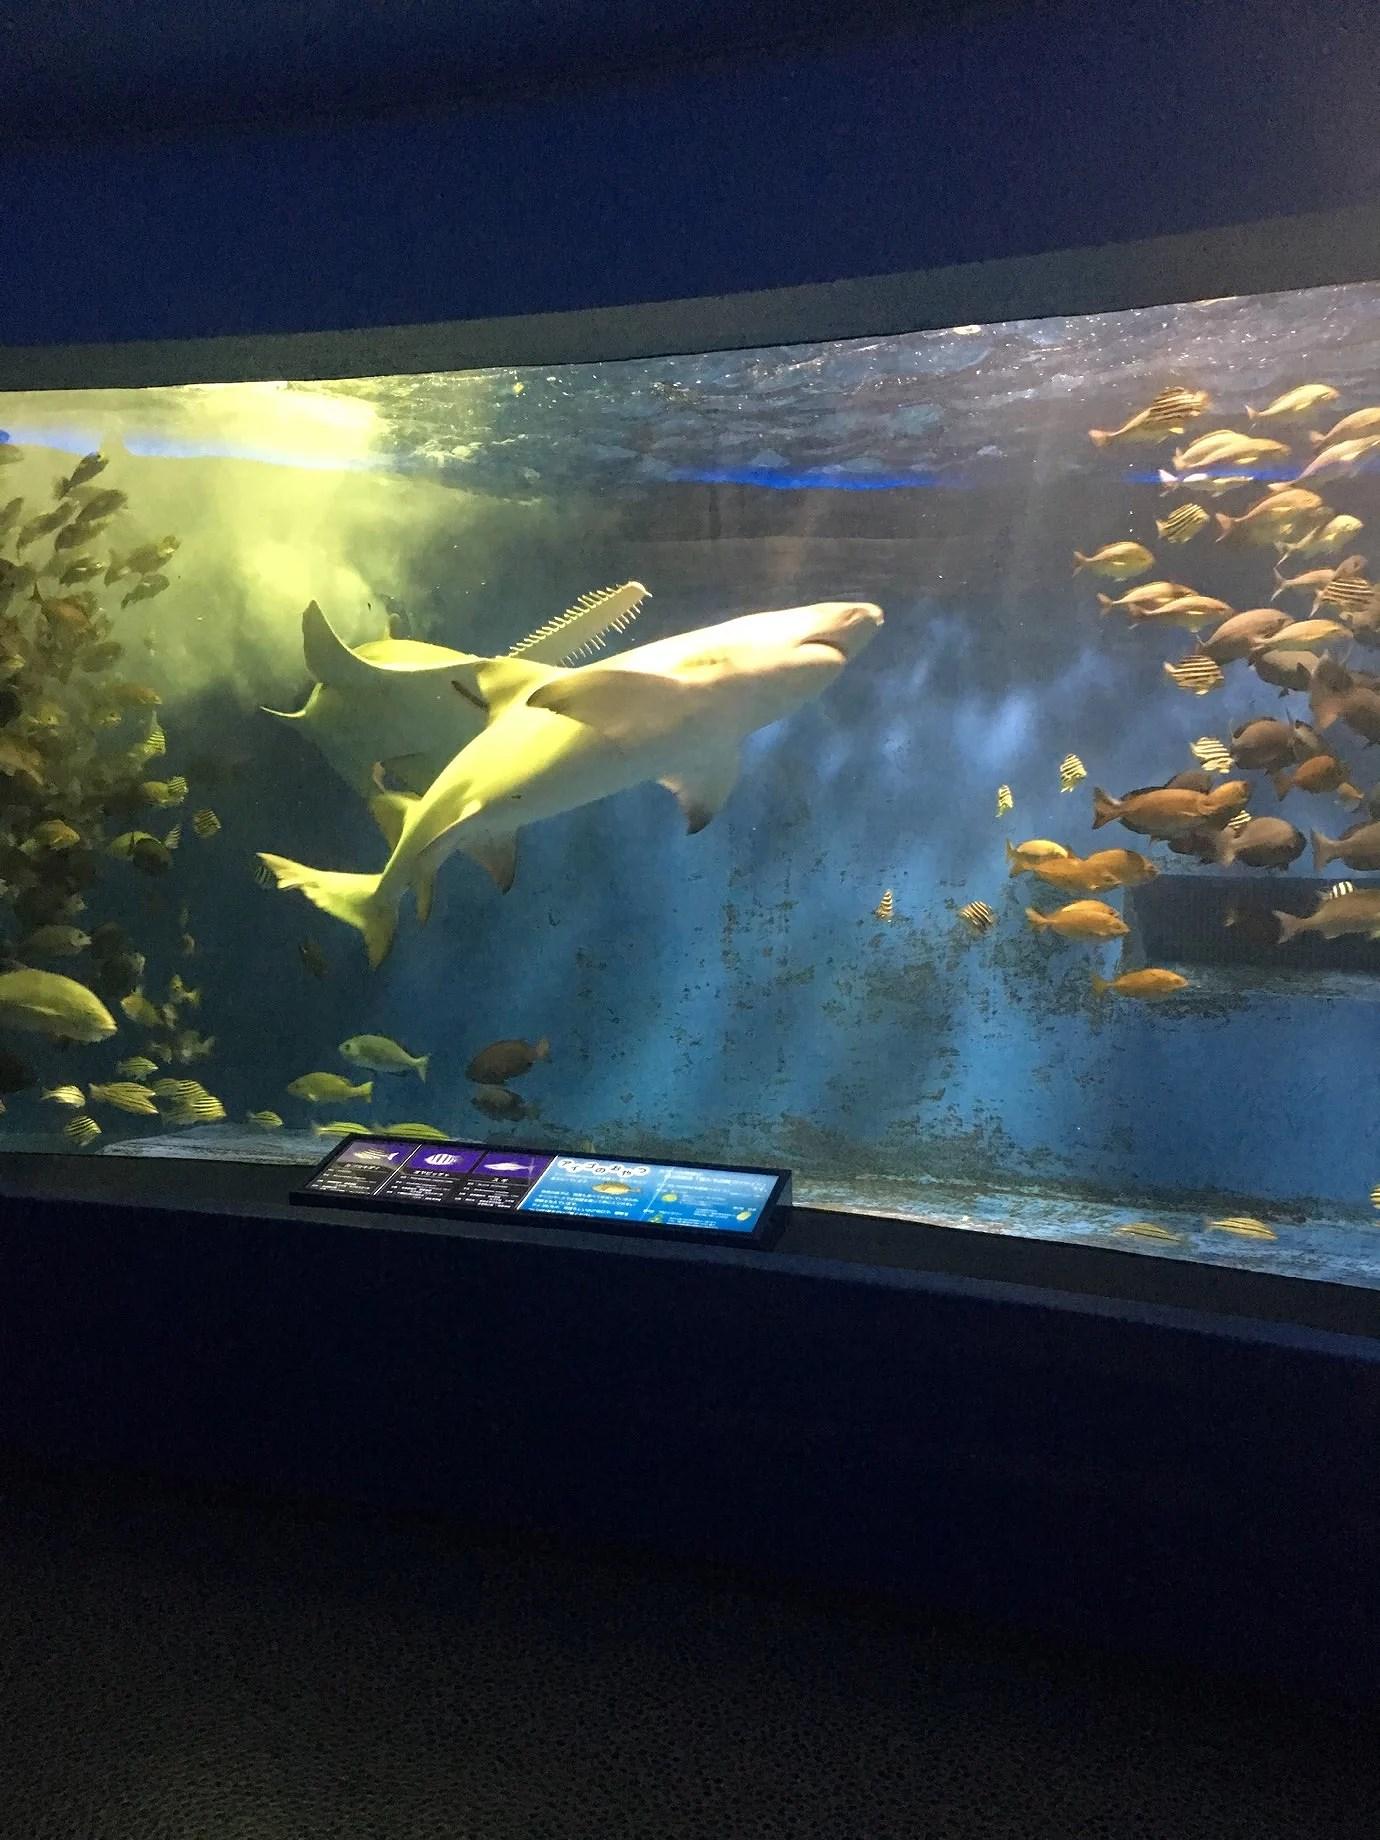 Pretty cool Aquarium